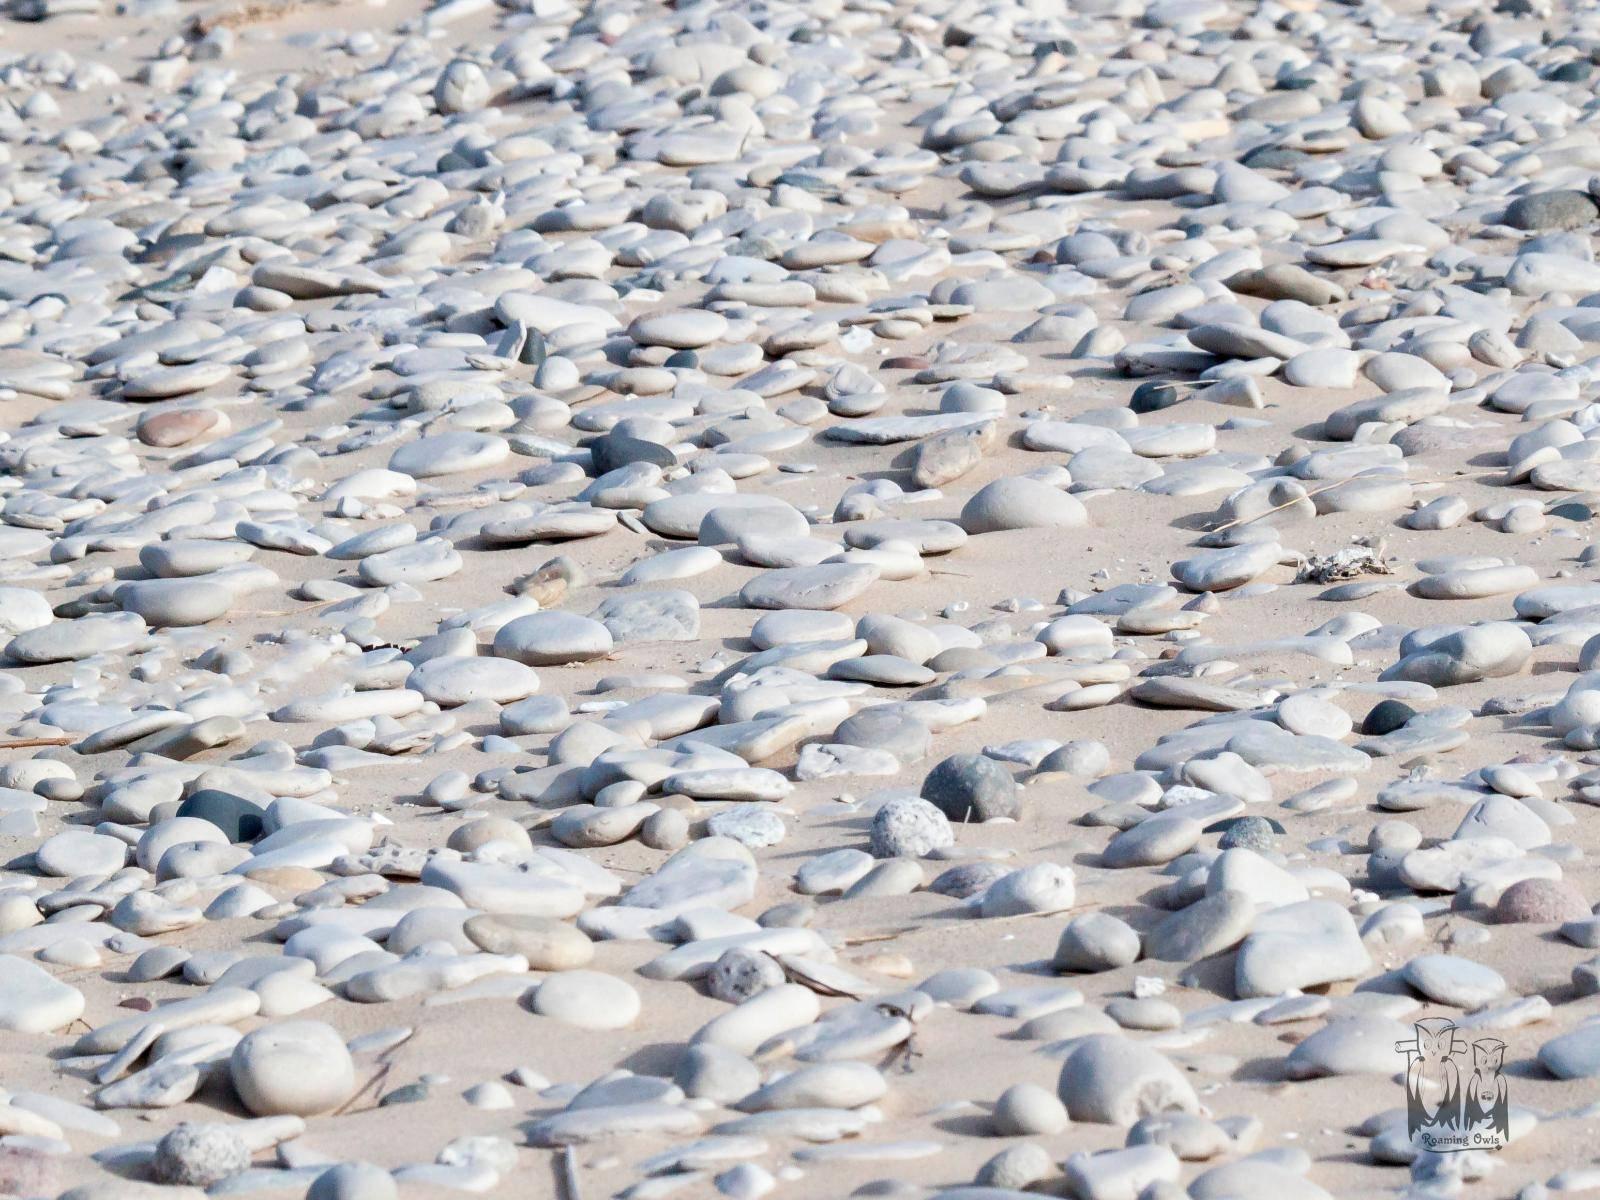 North Manitou Island,Lake Michigan Stones, Lake Shore Shells stones